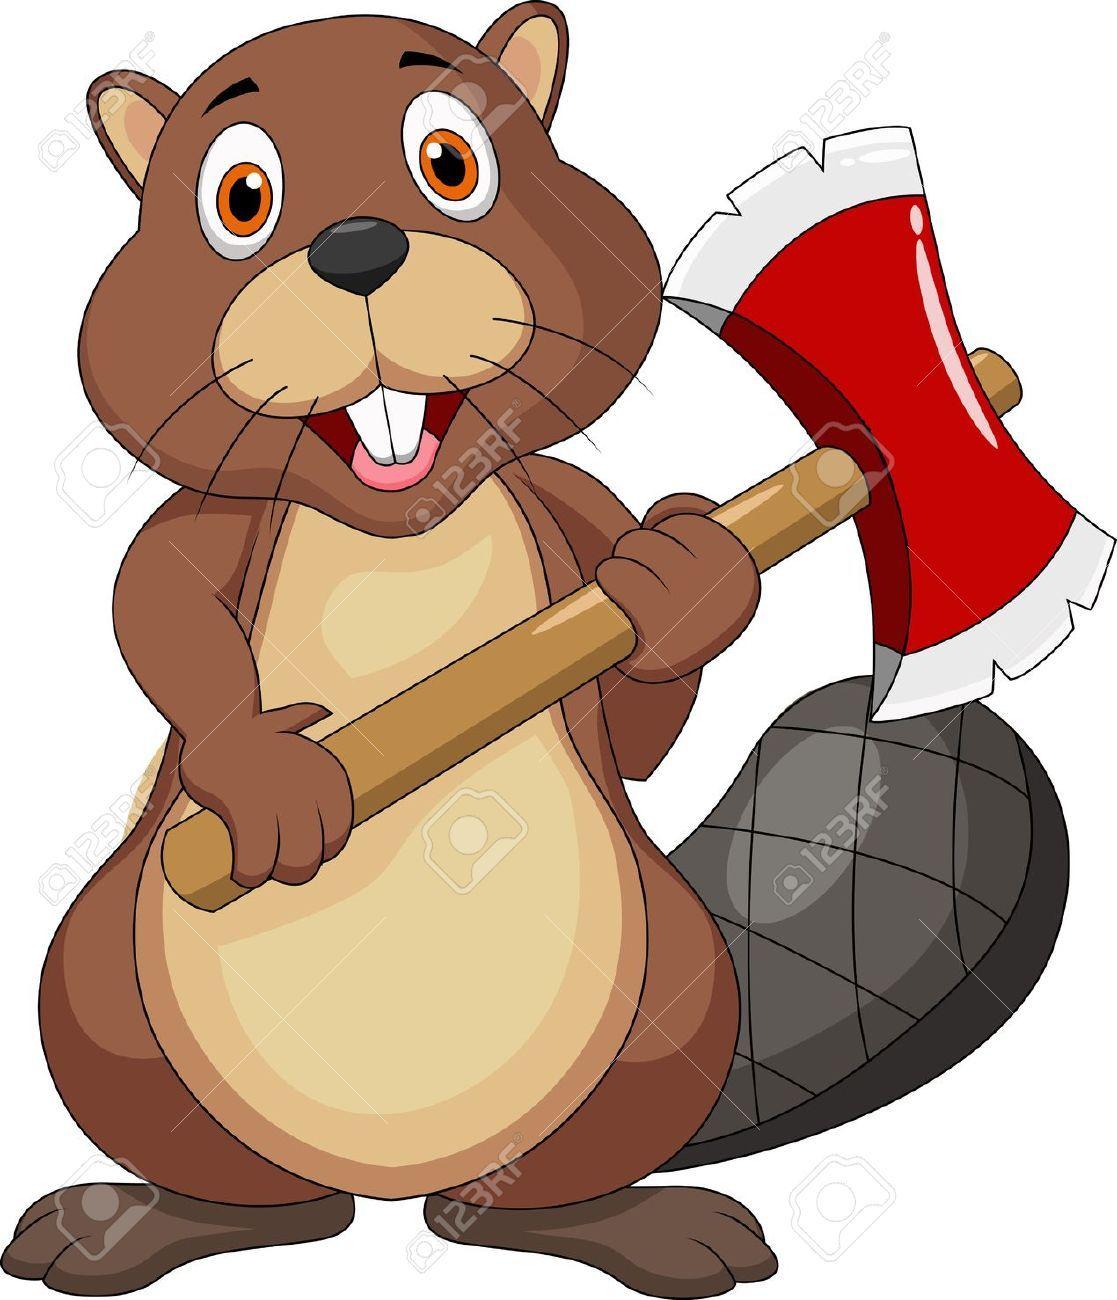 Beaver cartoon holding axe | crafts | Pinterest | Axe, Royalty and ...